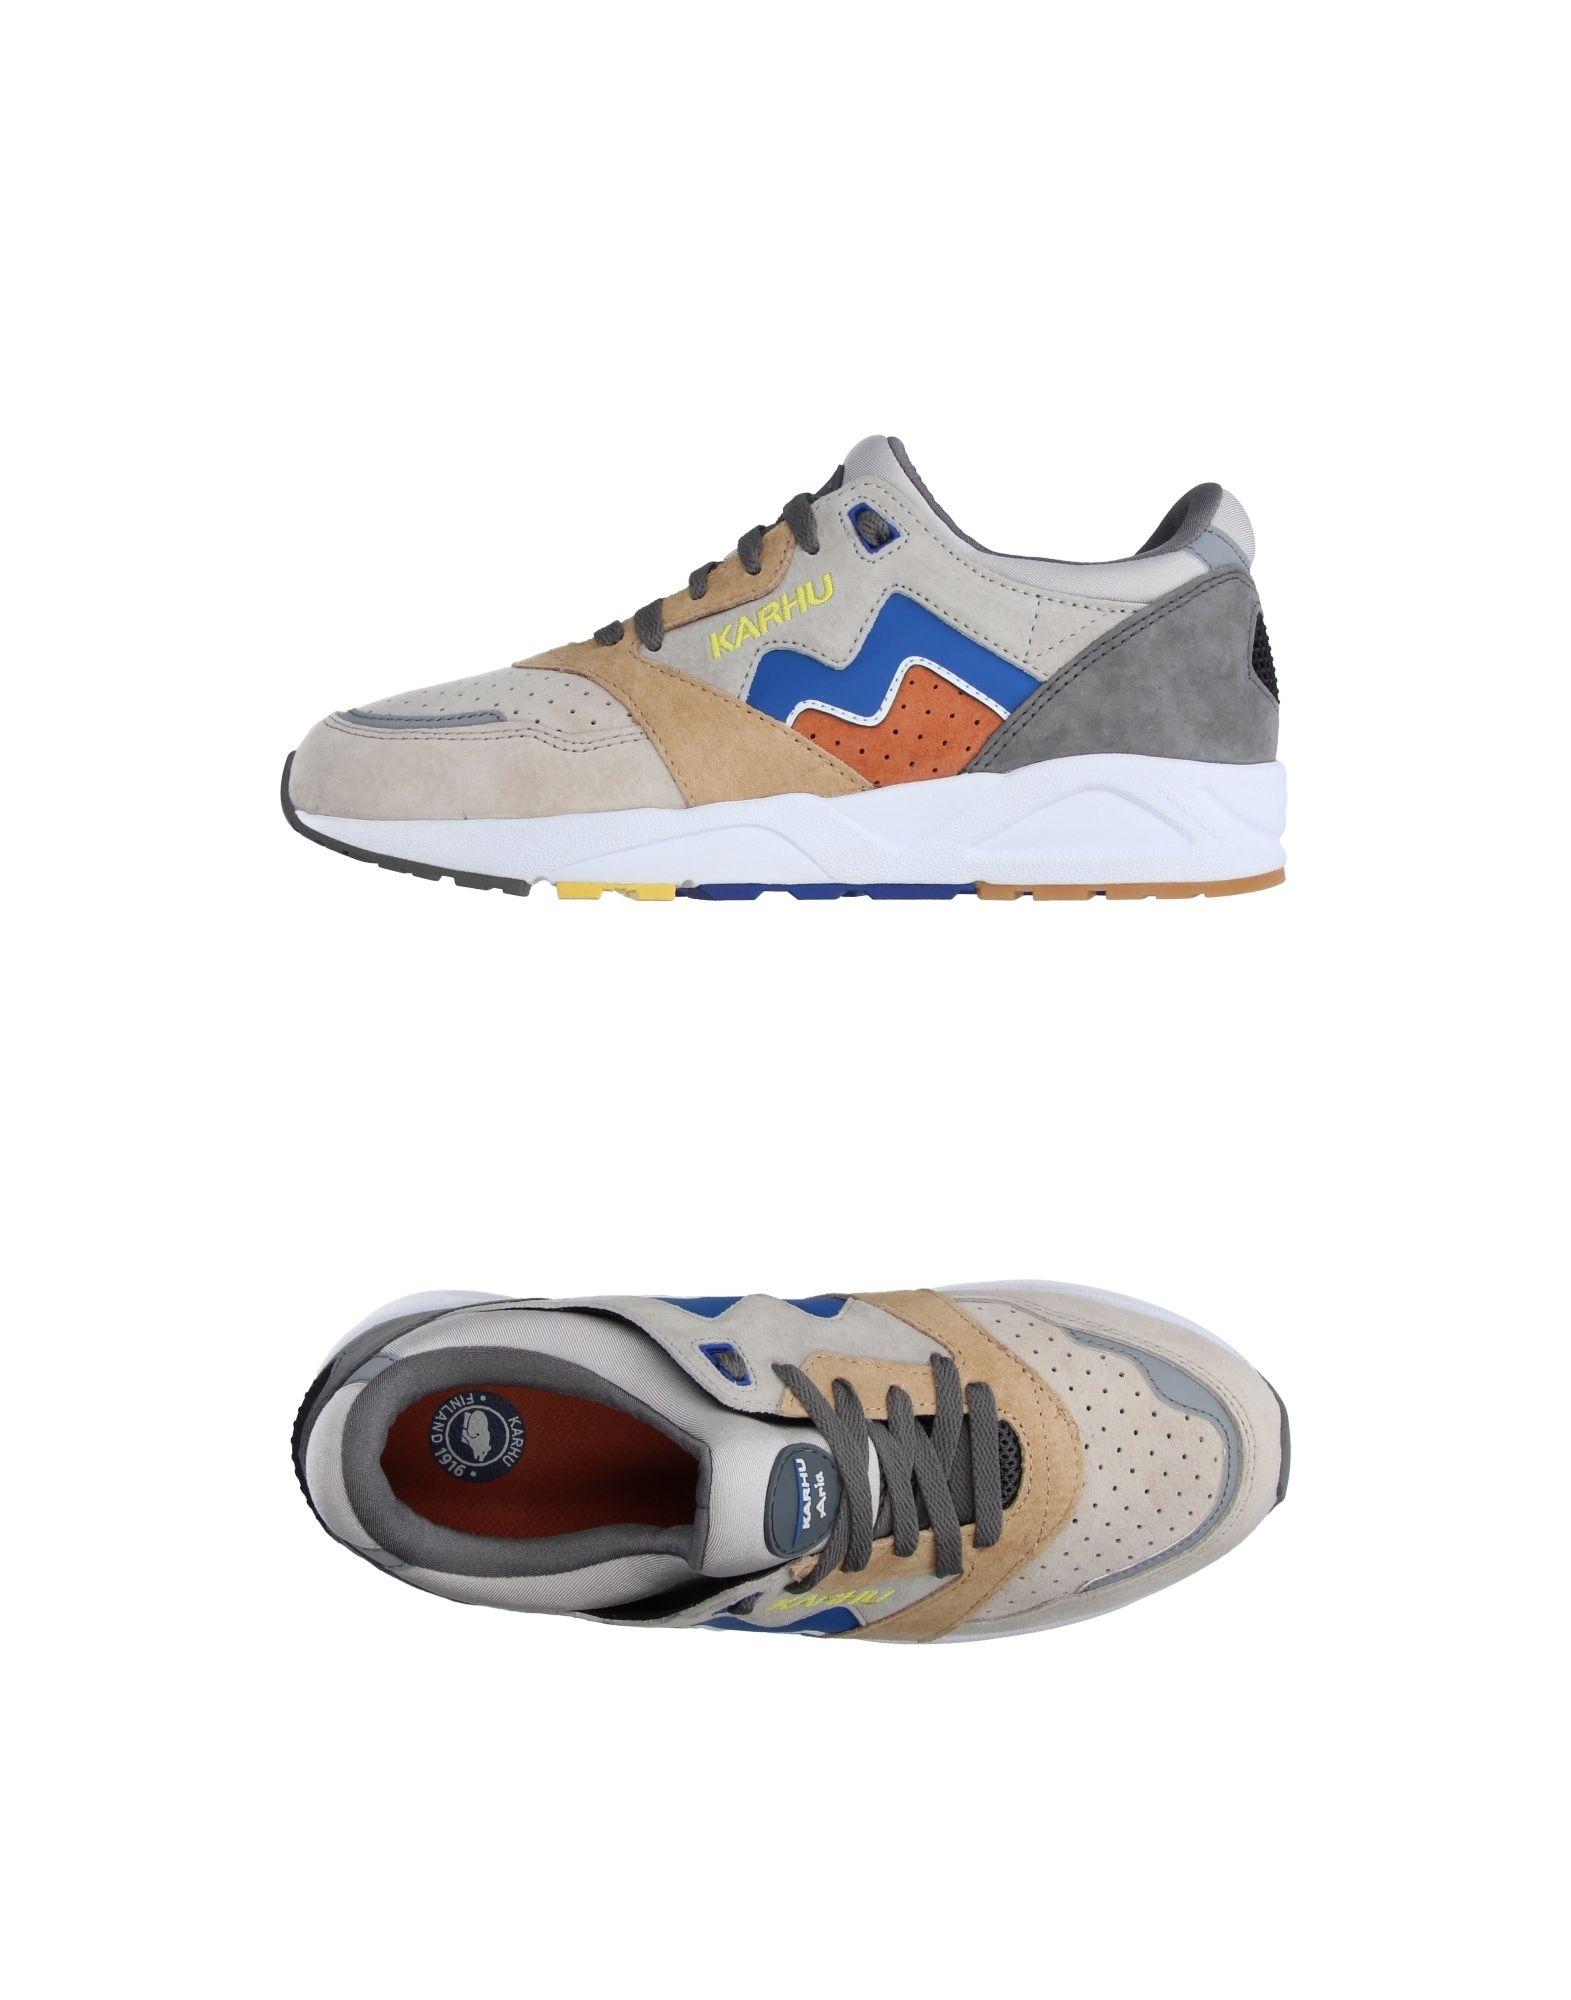 Rabatt Karhu echte Schuhe Karhu Rabatt Sneakers Herren  11209757QQ 72a040